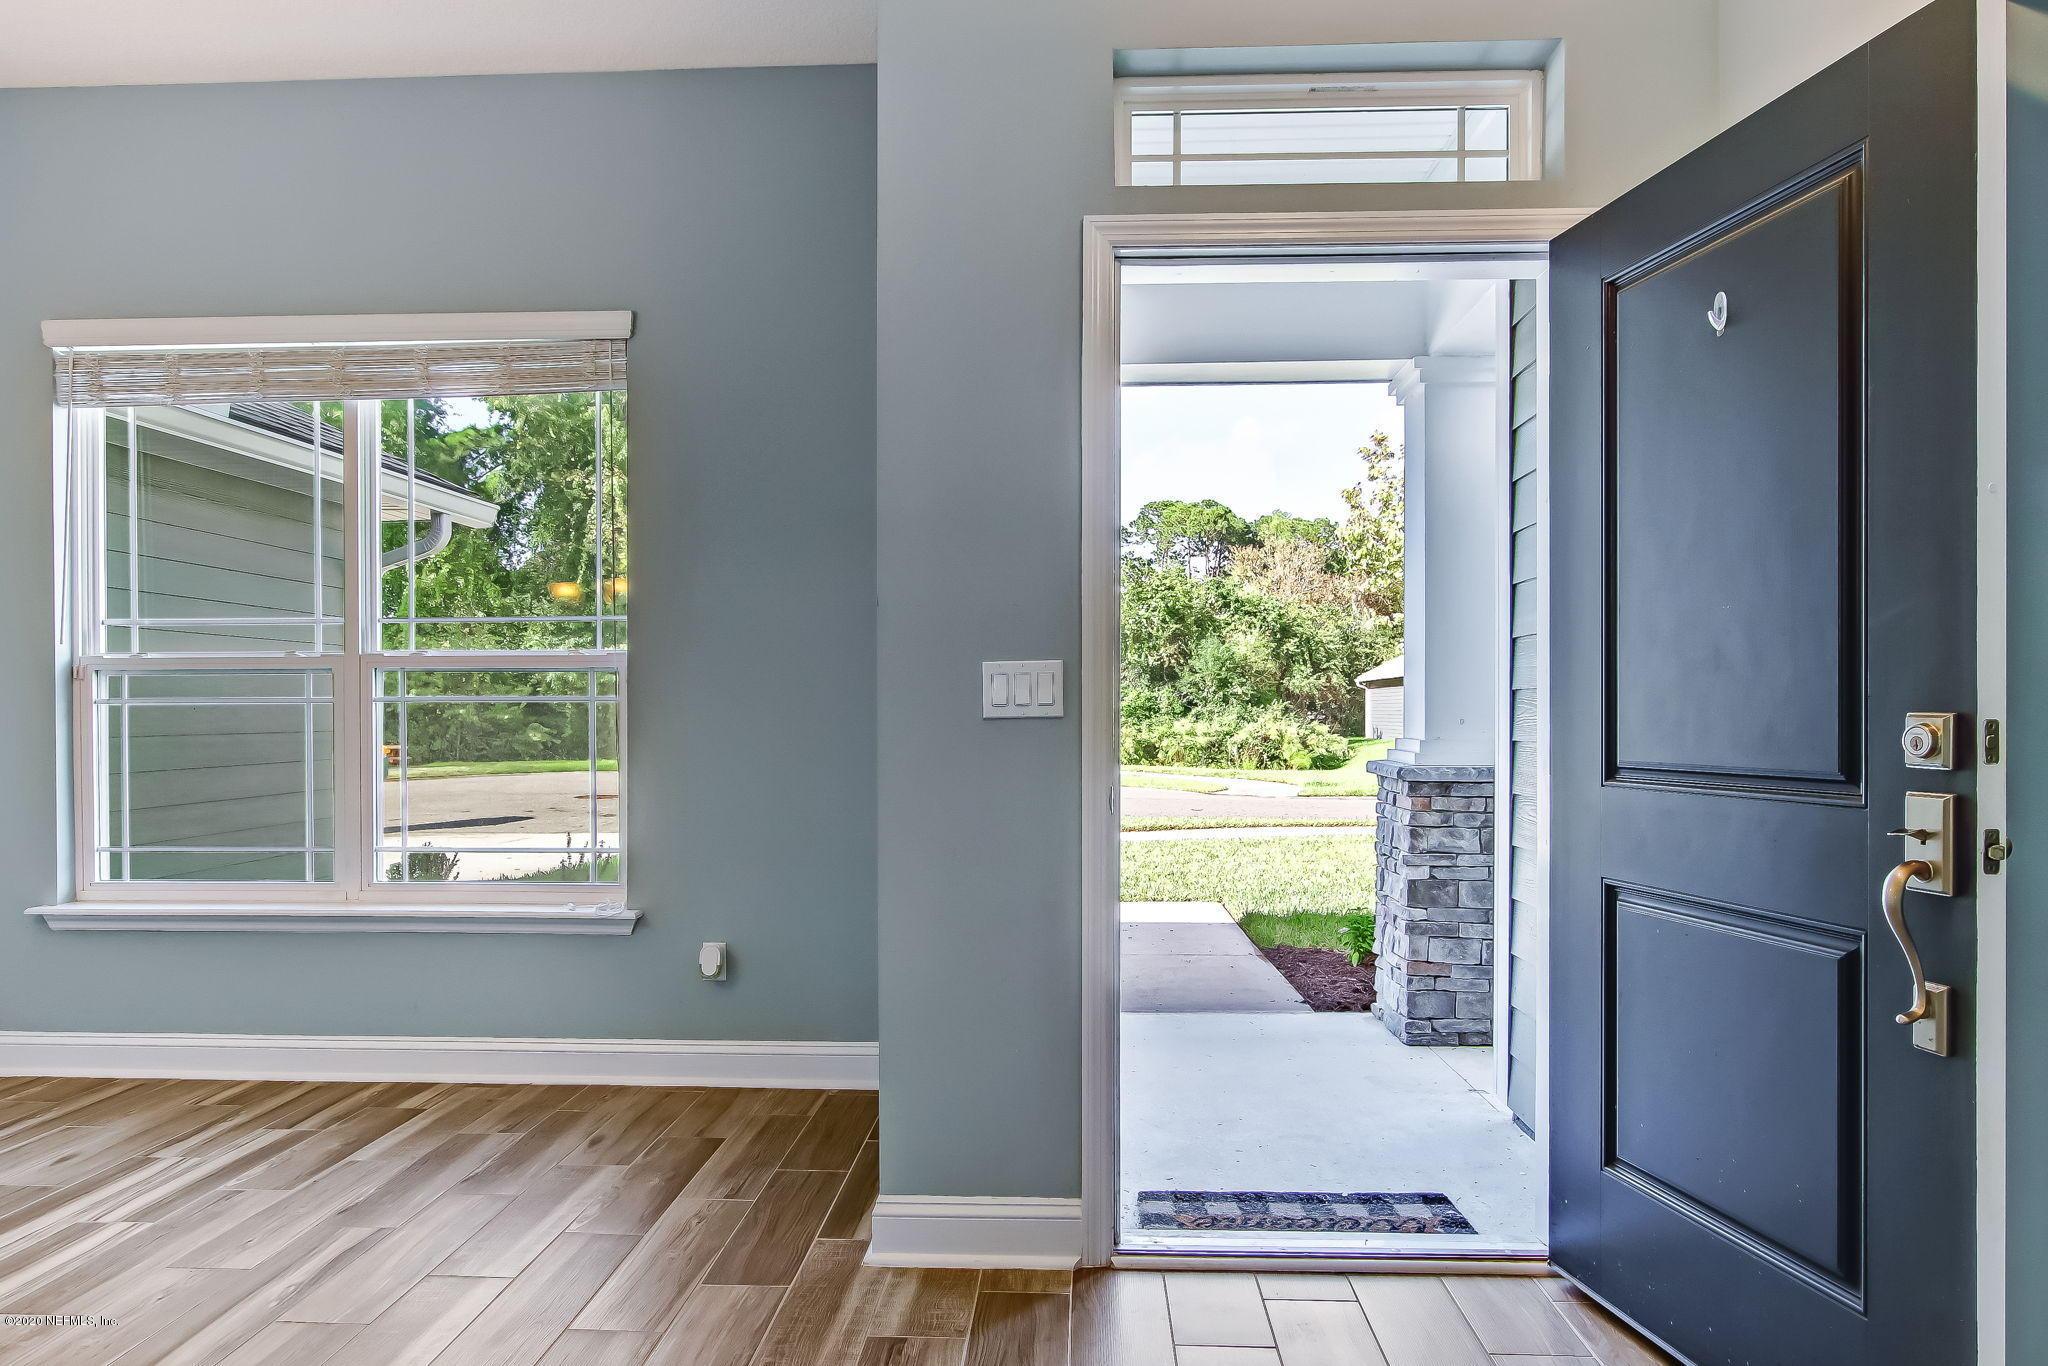 10718 LAWSON BRANCH, JACKSONVILLE, FLORIDA 32257, 4 Bedrooms Bedrooms, ,2 BathroomsBathrooms,Residential,For sale,LAWSON BRANCH,1080352